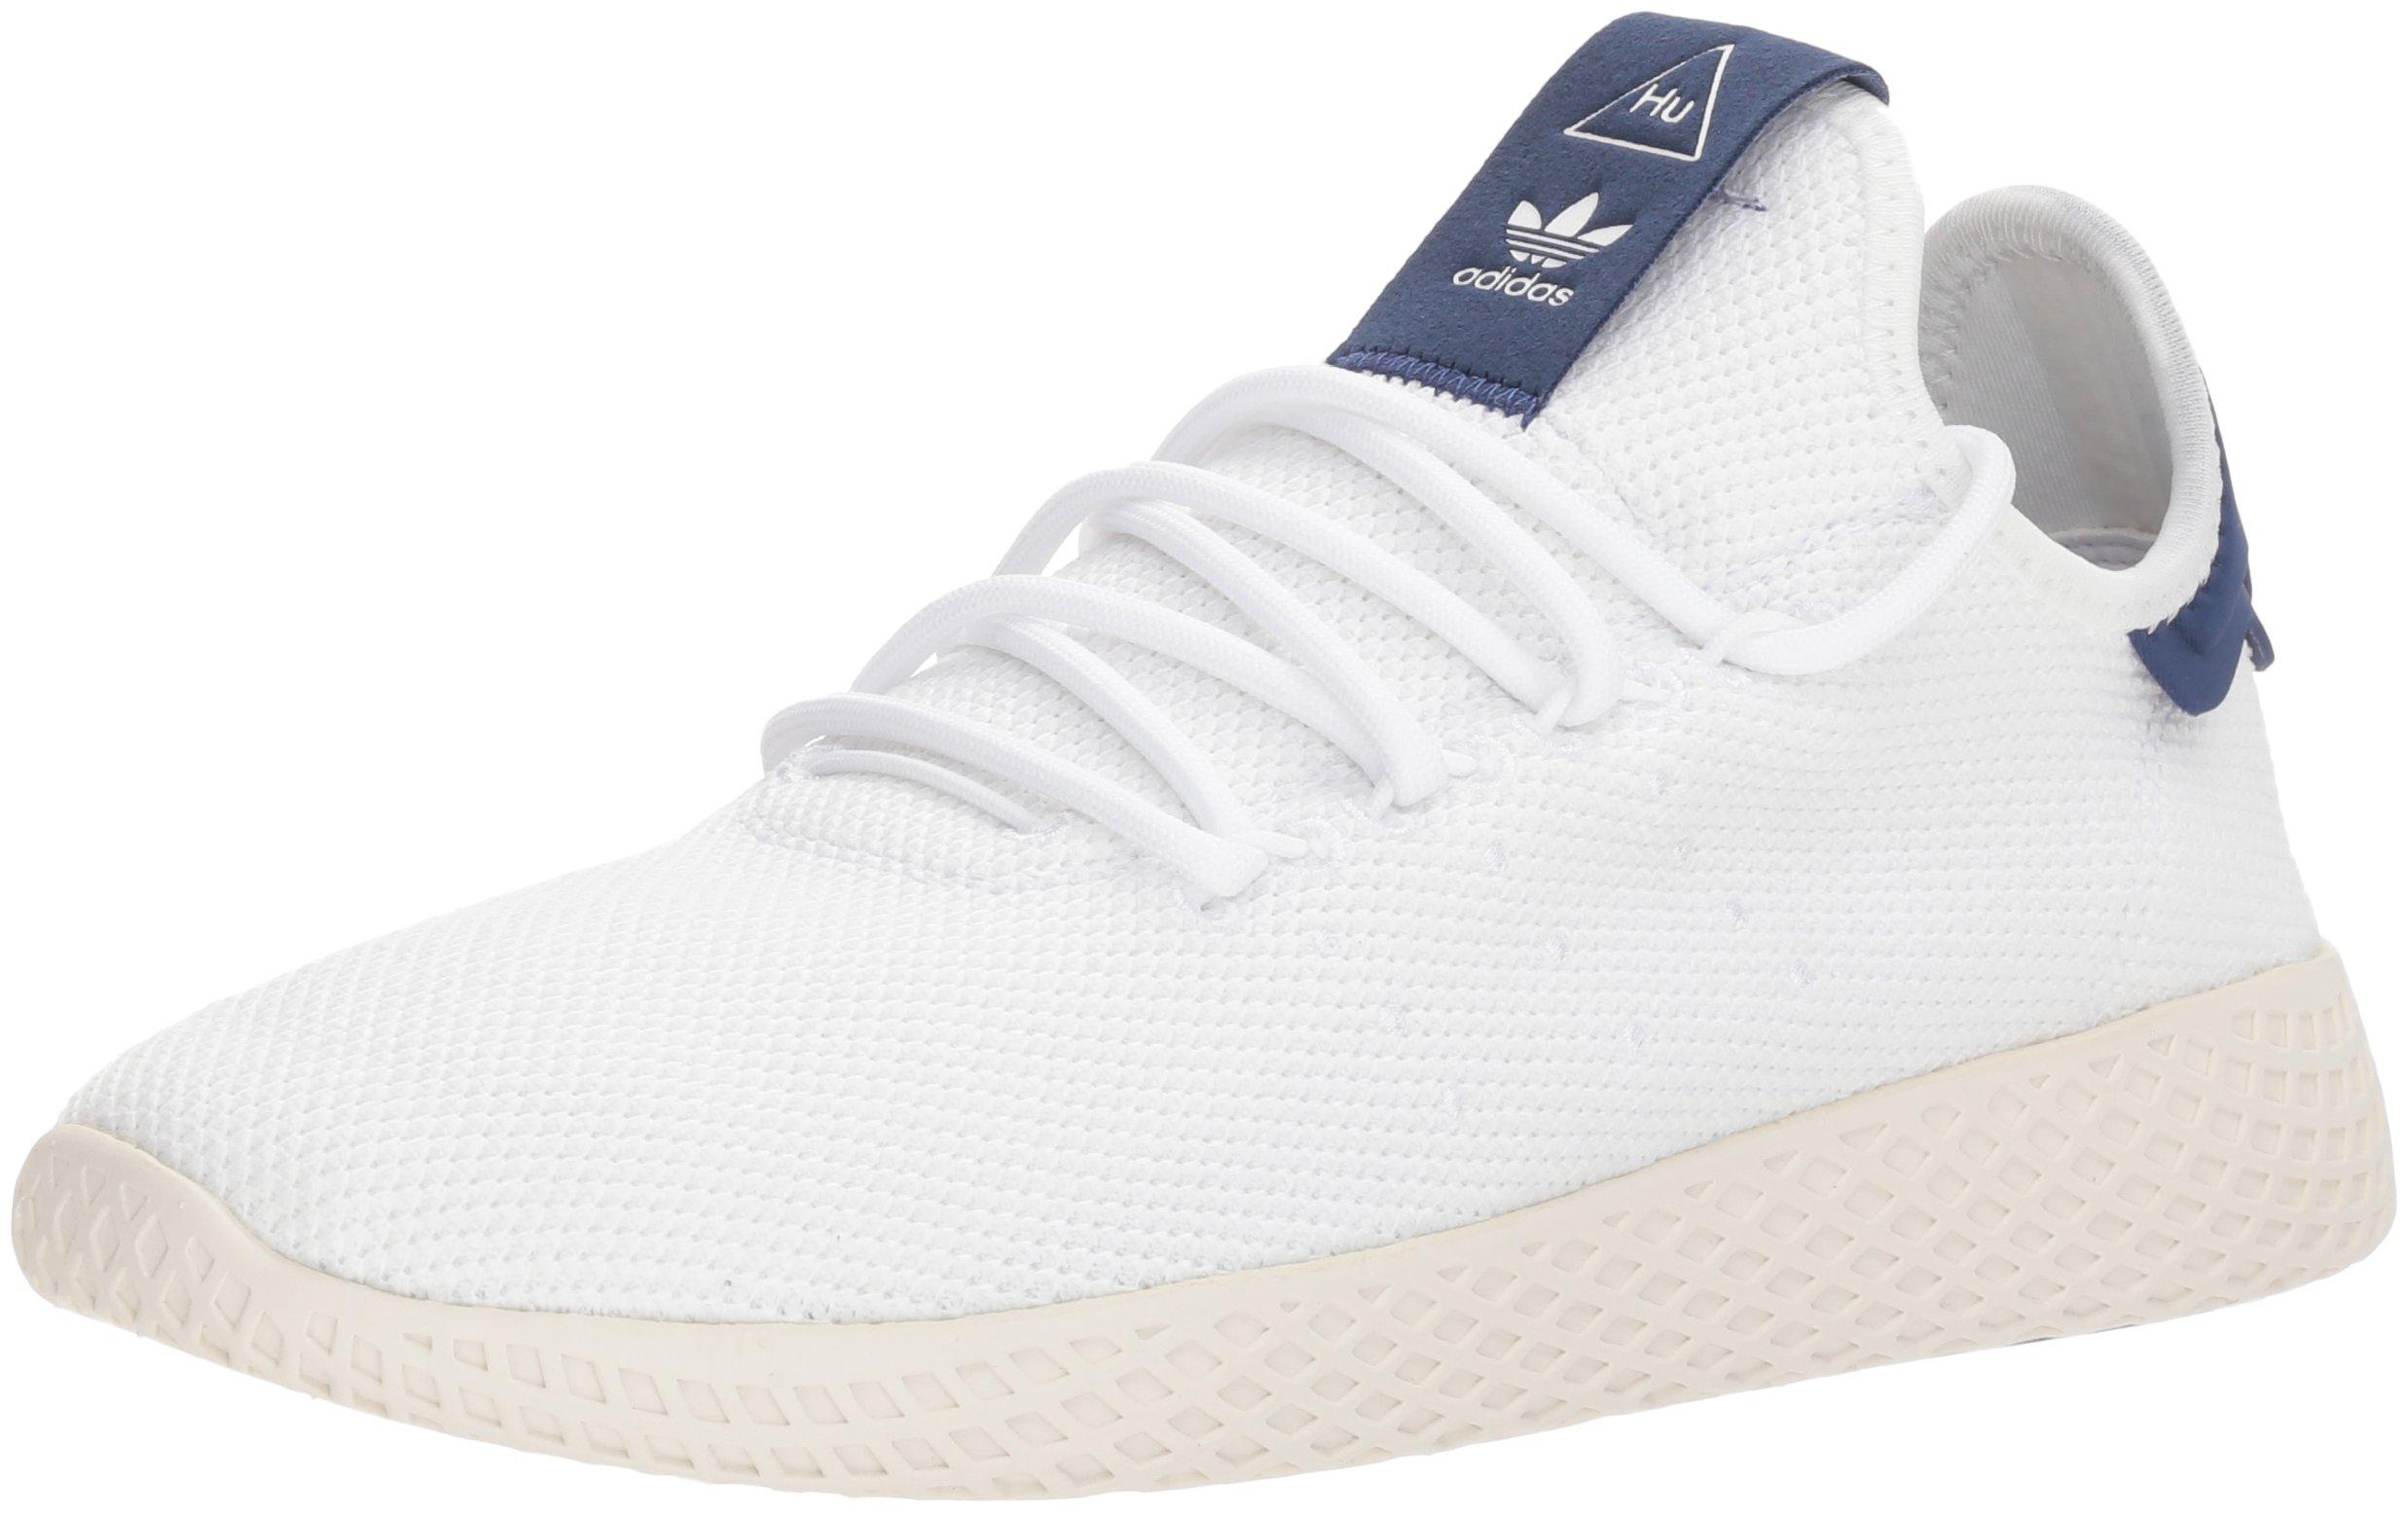 adidas Women's PW Tennis hu W Sneaker, Ftwr White, Ftwr White, chalk White, 8.5 M US